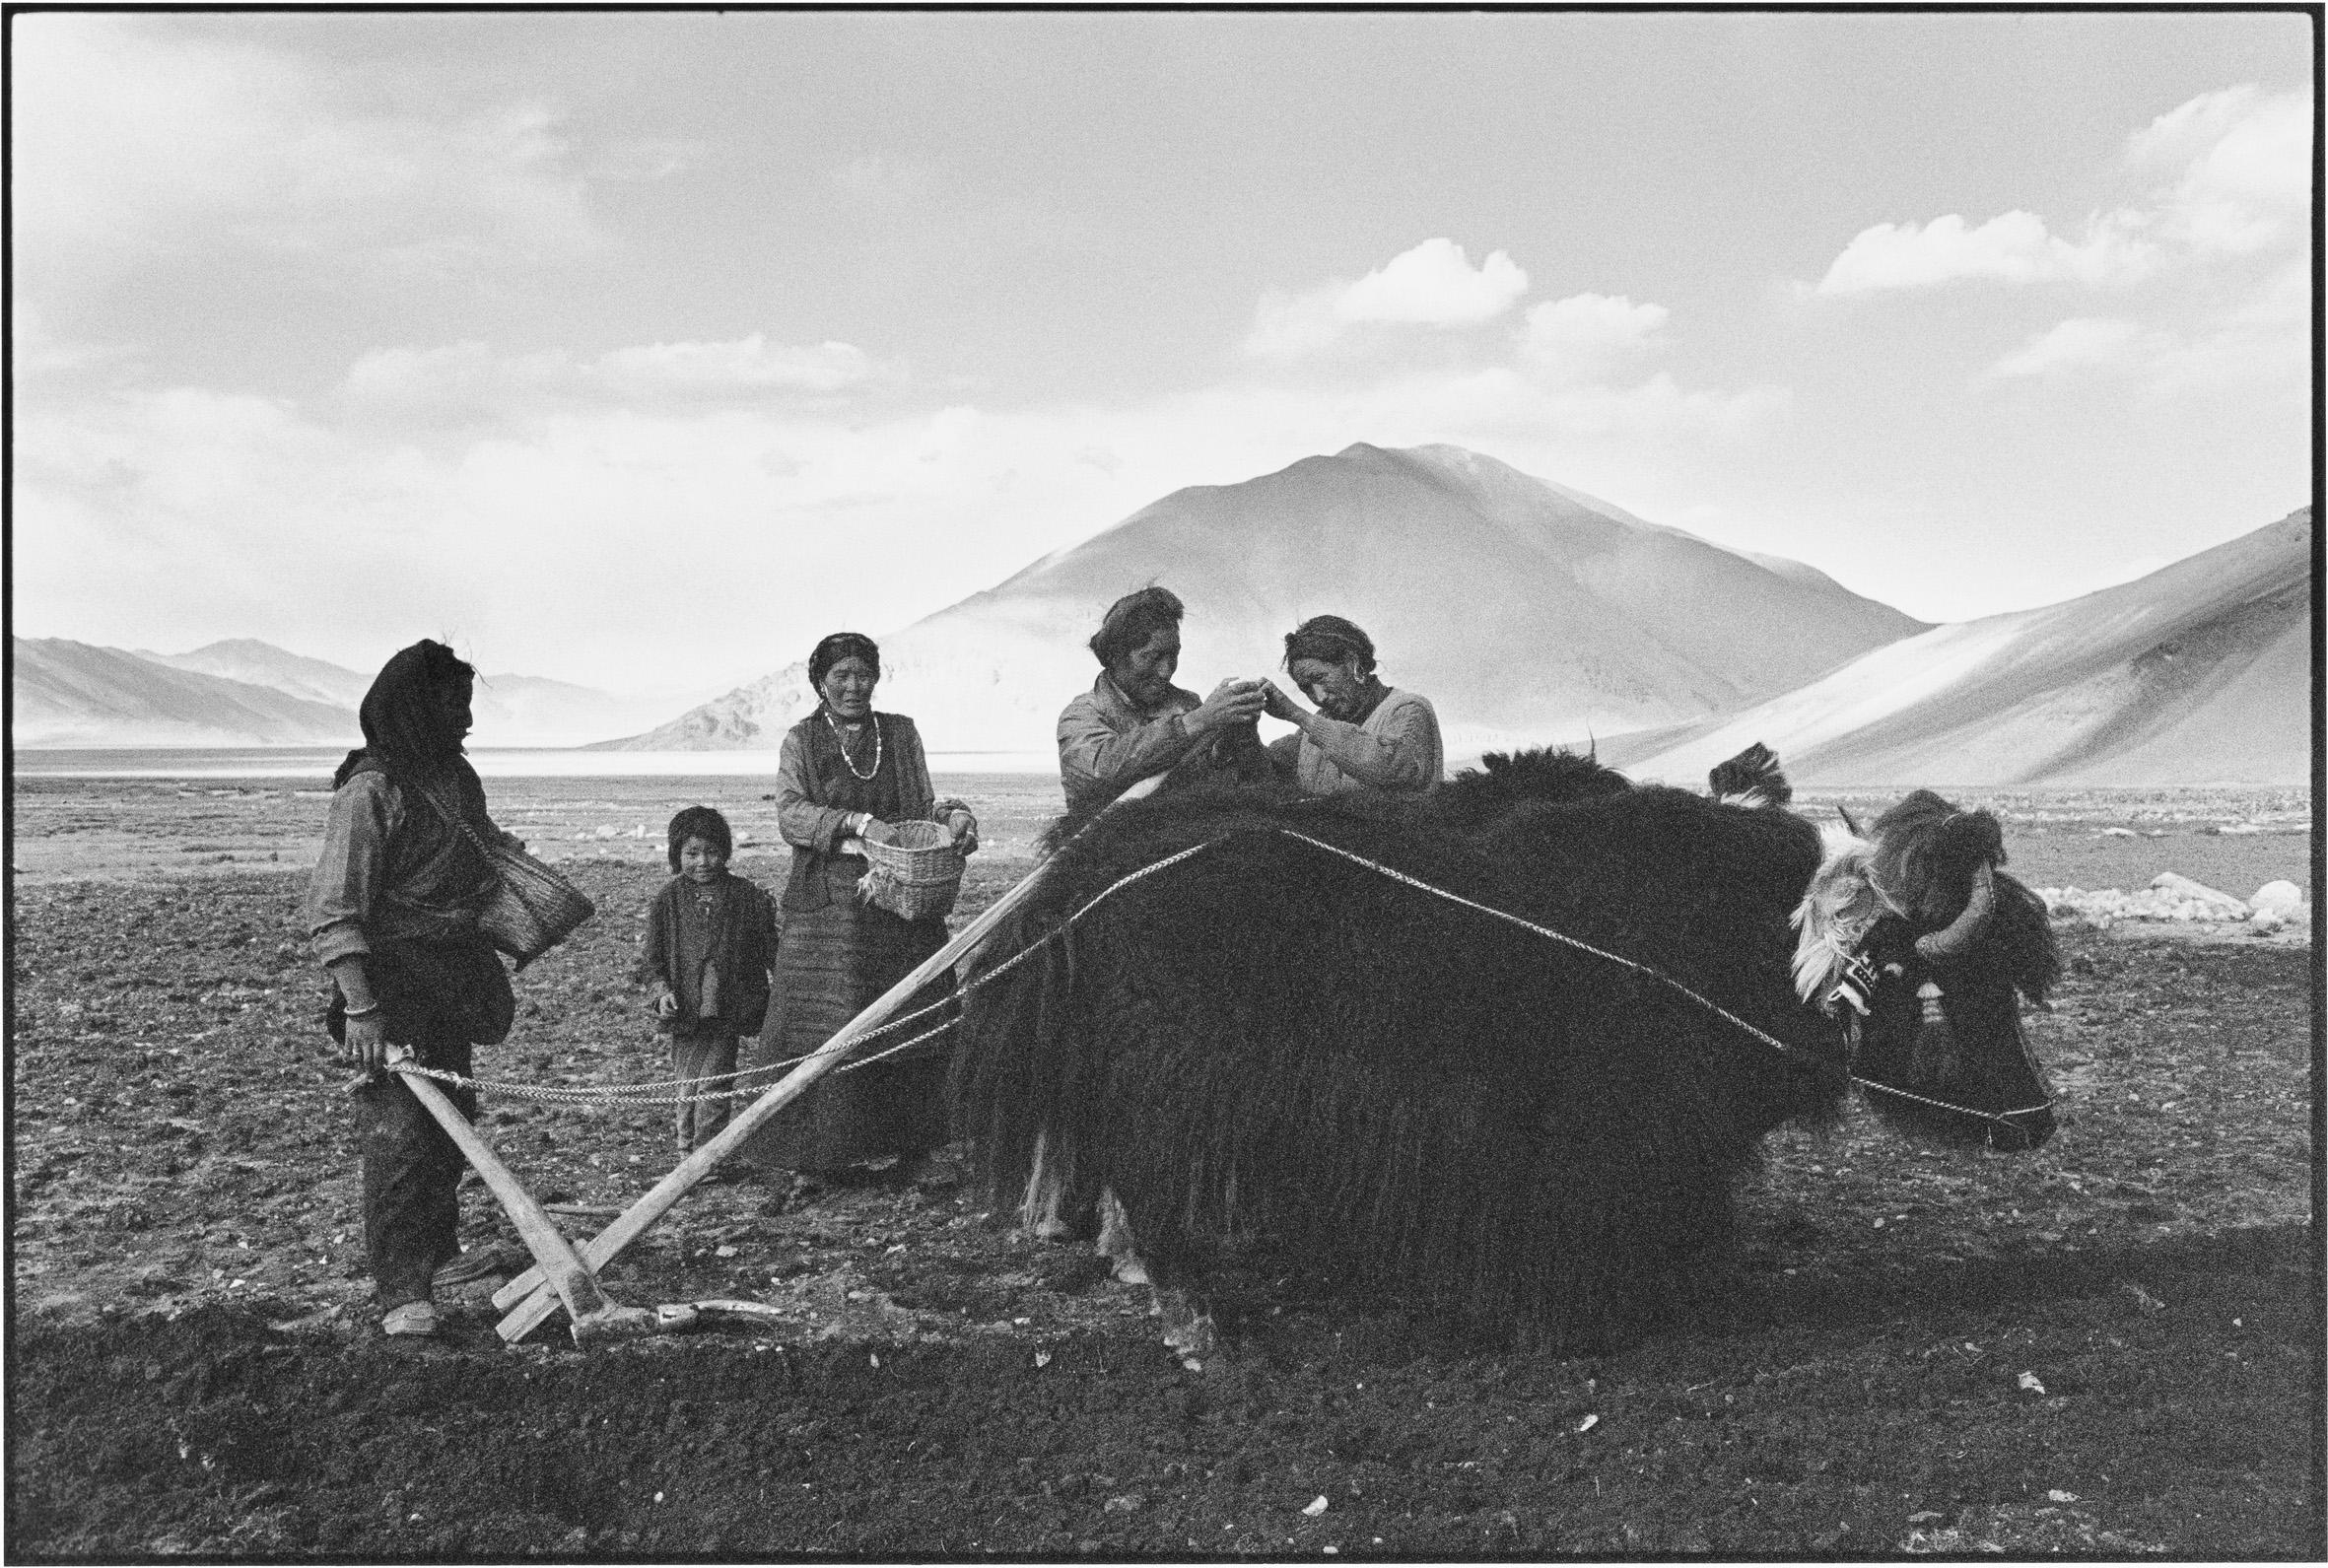 Mending the Plough, Tibet